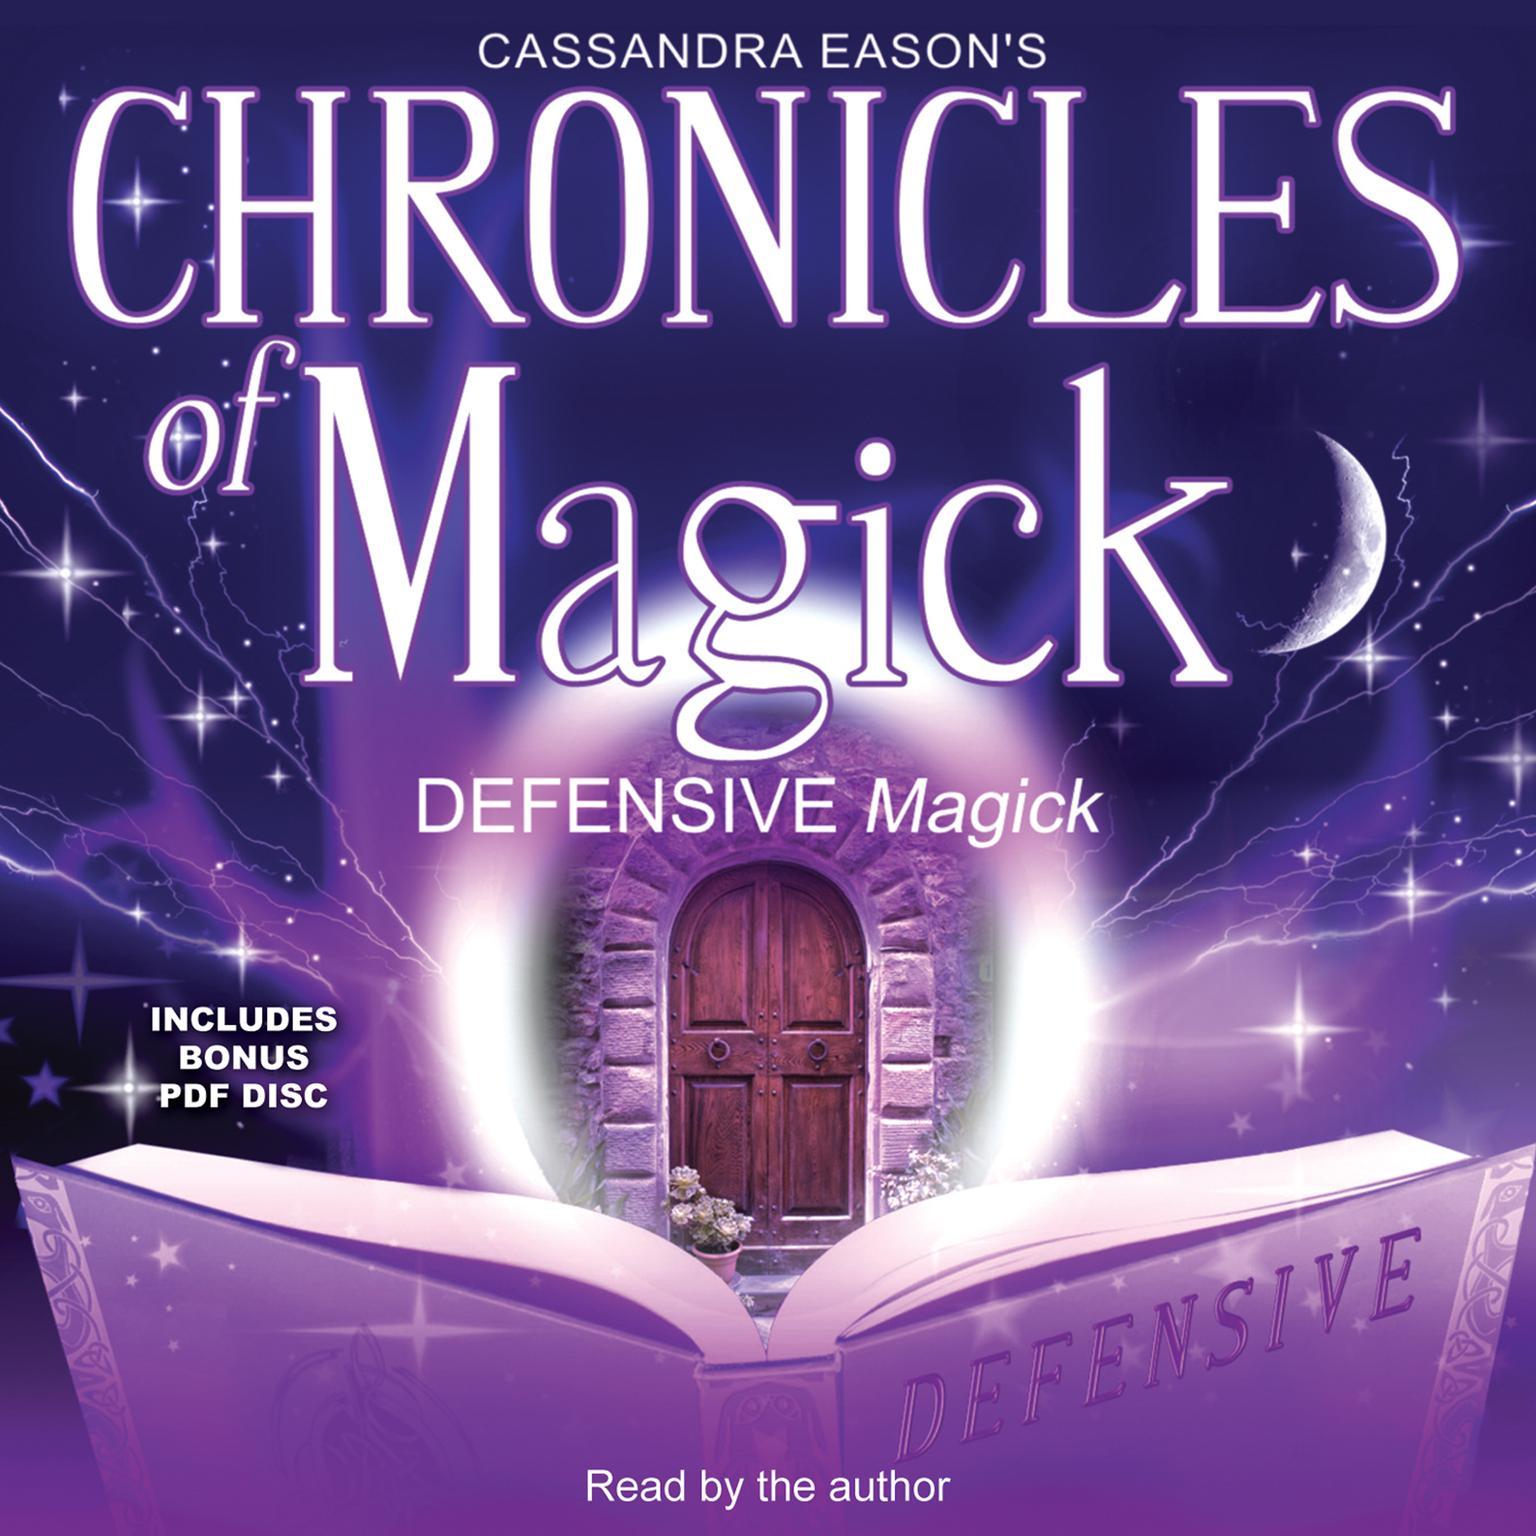 Printable Chronicles of Magick: Defensive Magick Audiobook Cover Art